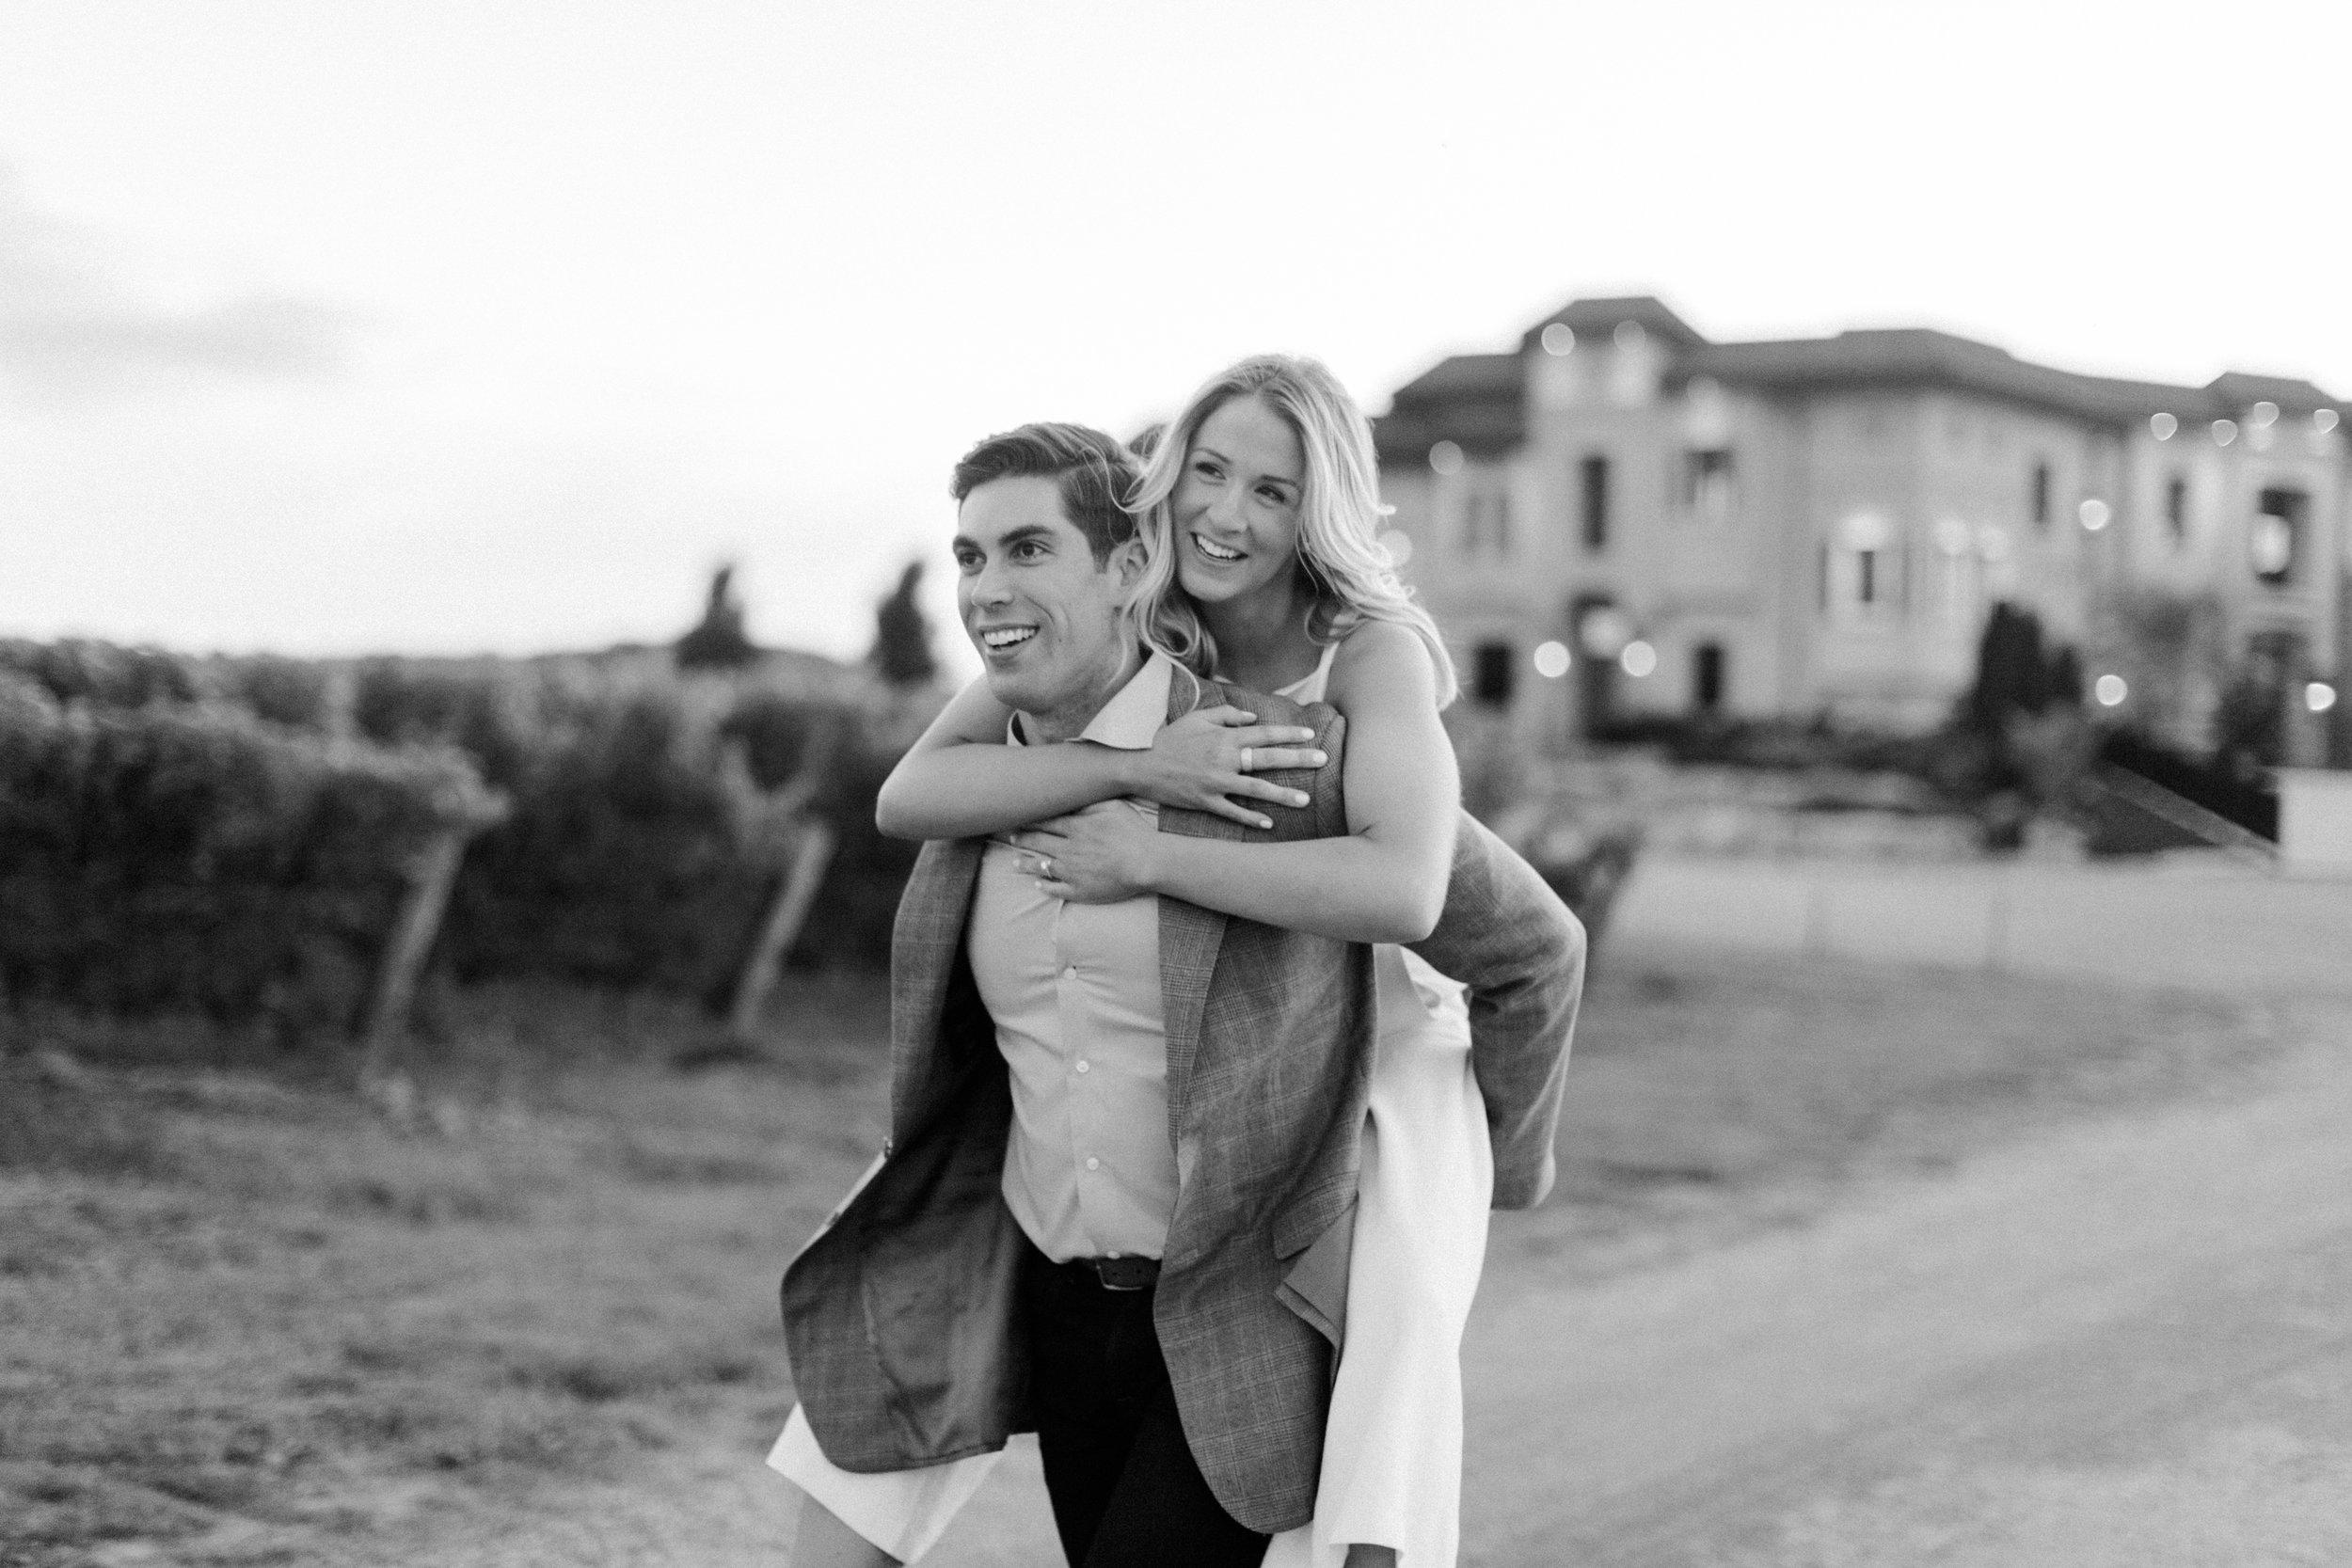 kurtz-orchard-gracewood-winery-wedding-photographer-richelle-hunter-sarah-jonathan-181.jpg